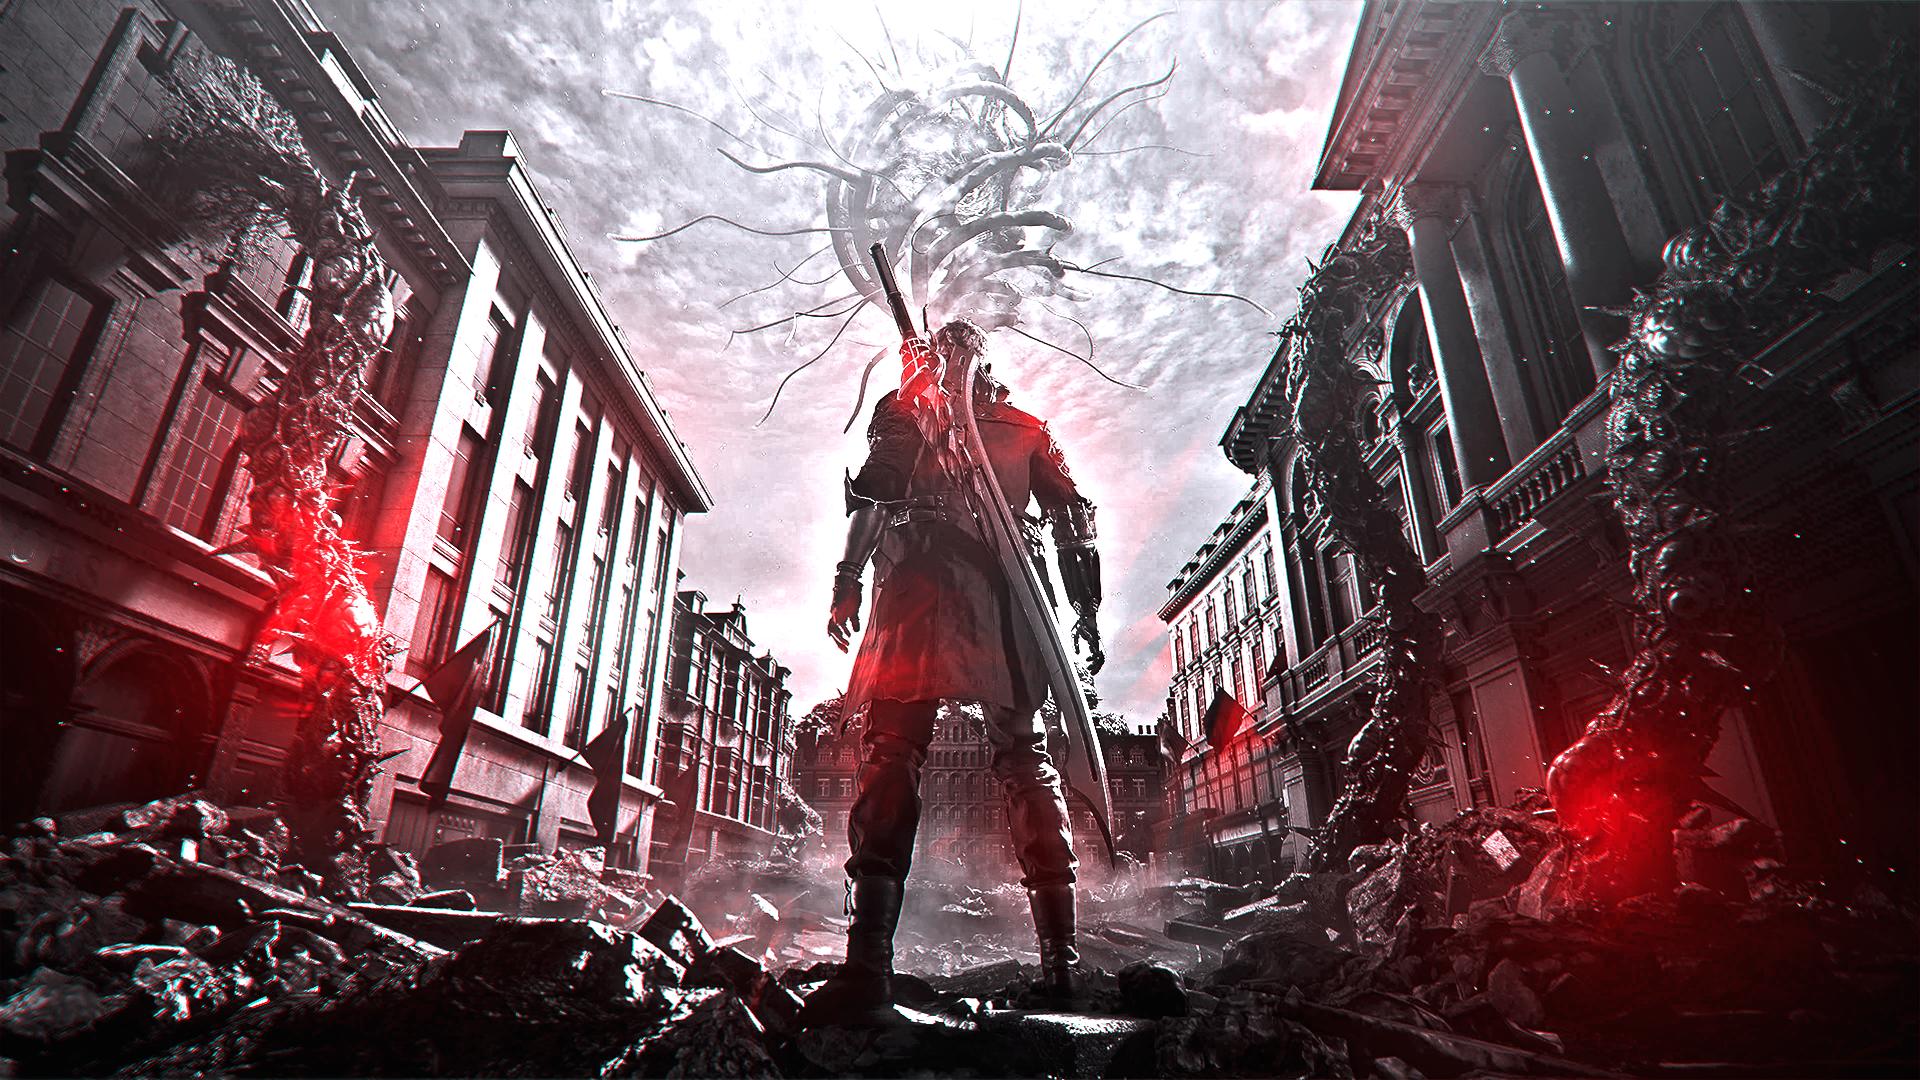 Devil May Cry 5 Wallpaper: Devil May Cry 5 Wallpaper Edit By Sir-R34 On DeviantArt